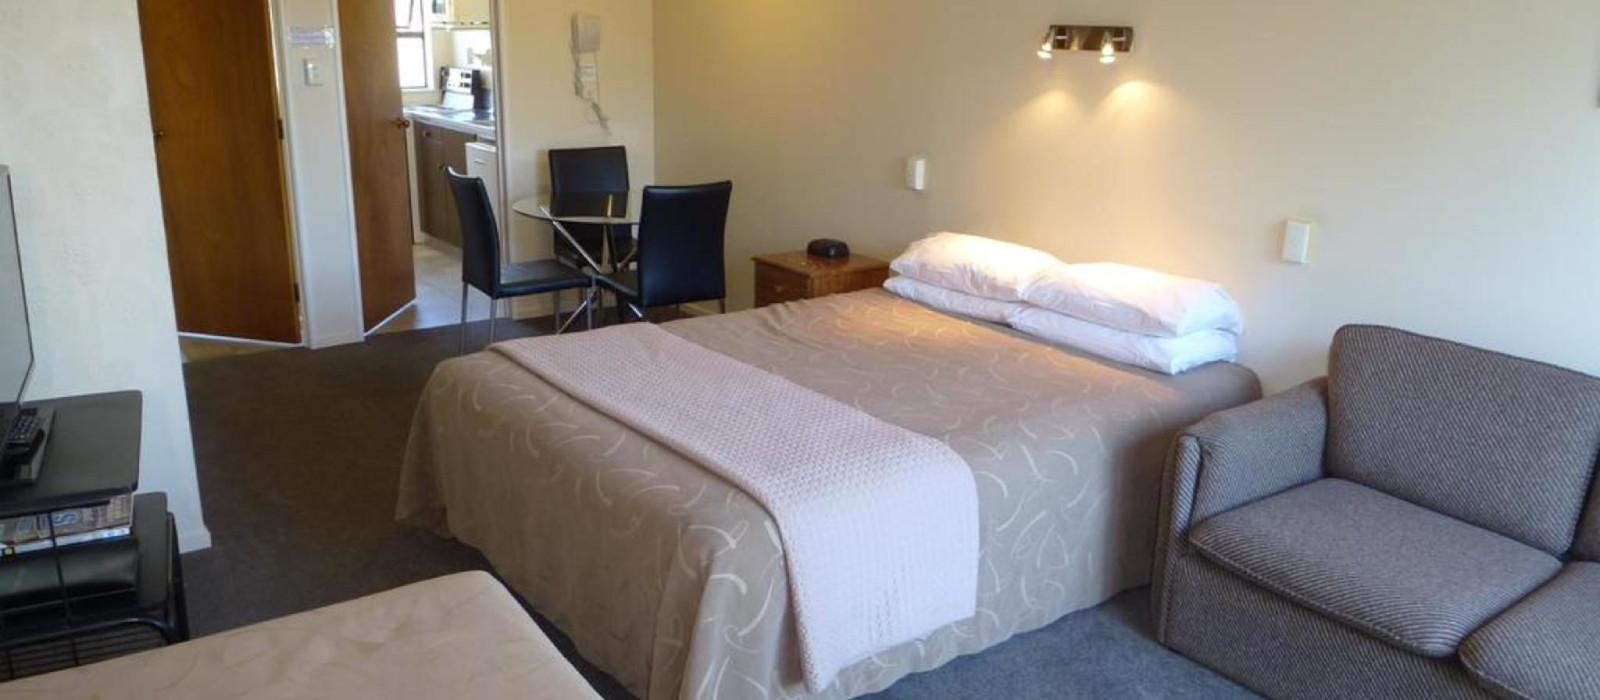 Hotel Balmoral Motel New Zealand